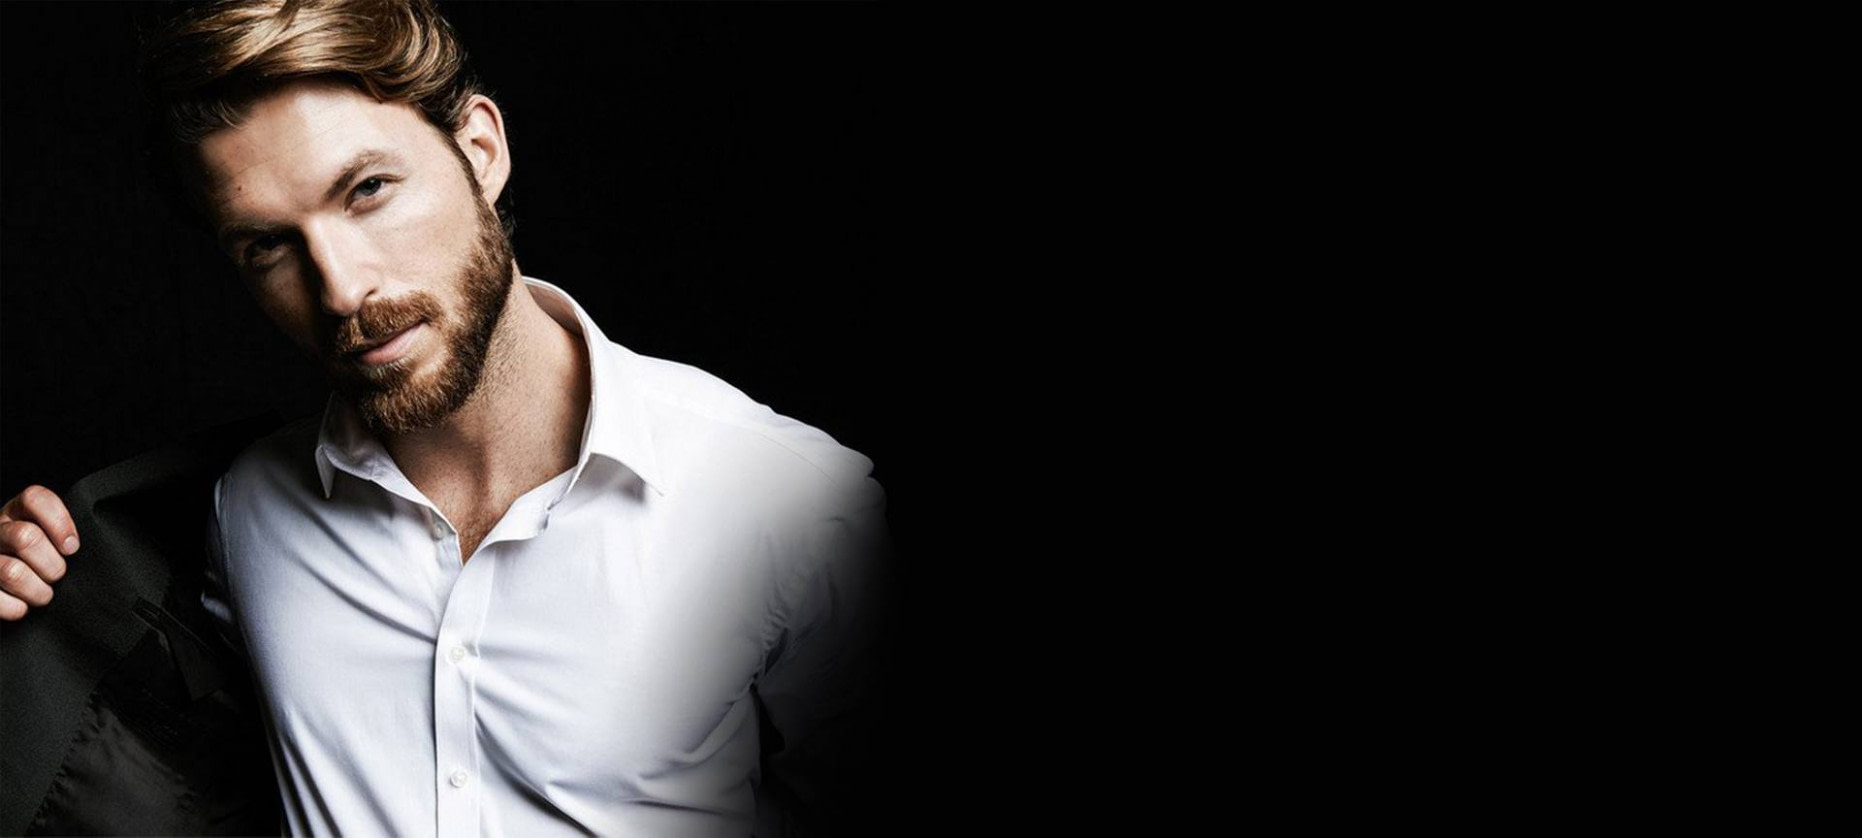 Die Besten Frisuren Für Geheimratsecken  L'ORÉAL MEN EXPERT - Frisuren Männer Lichtes Haar